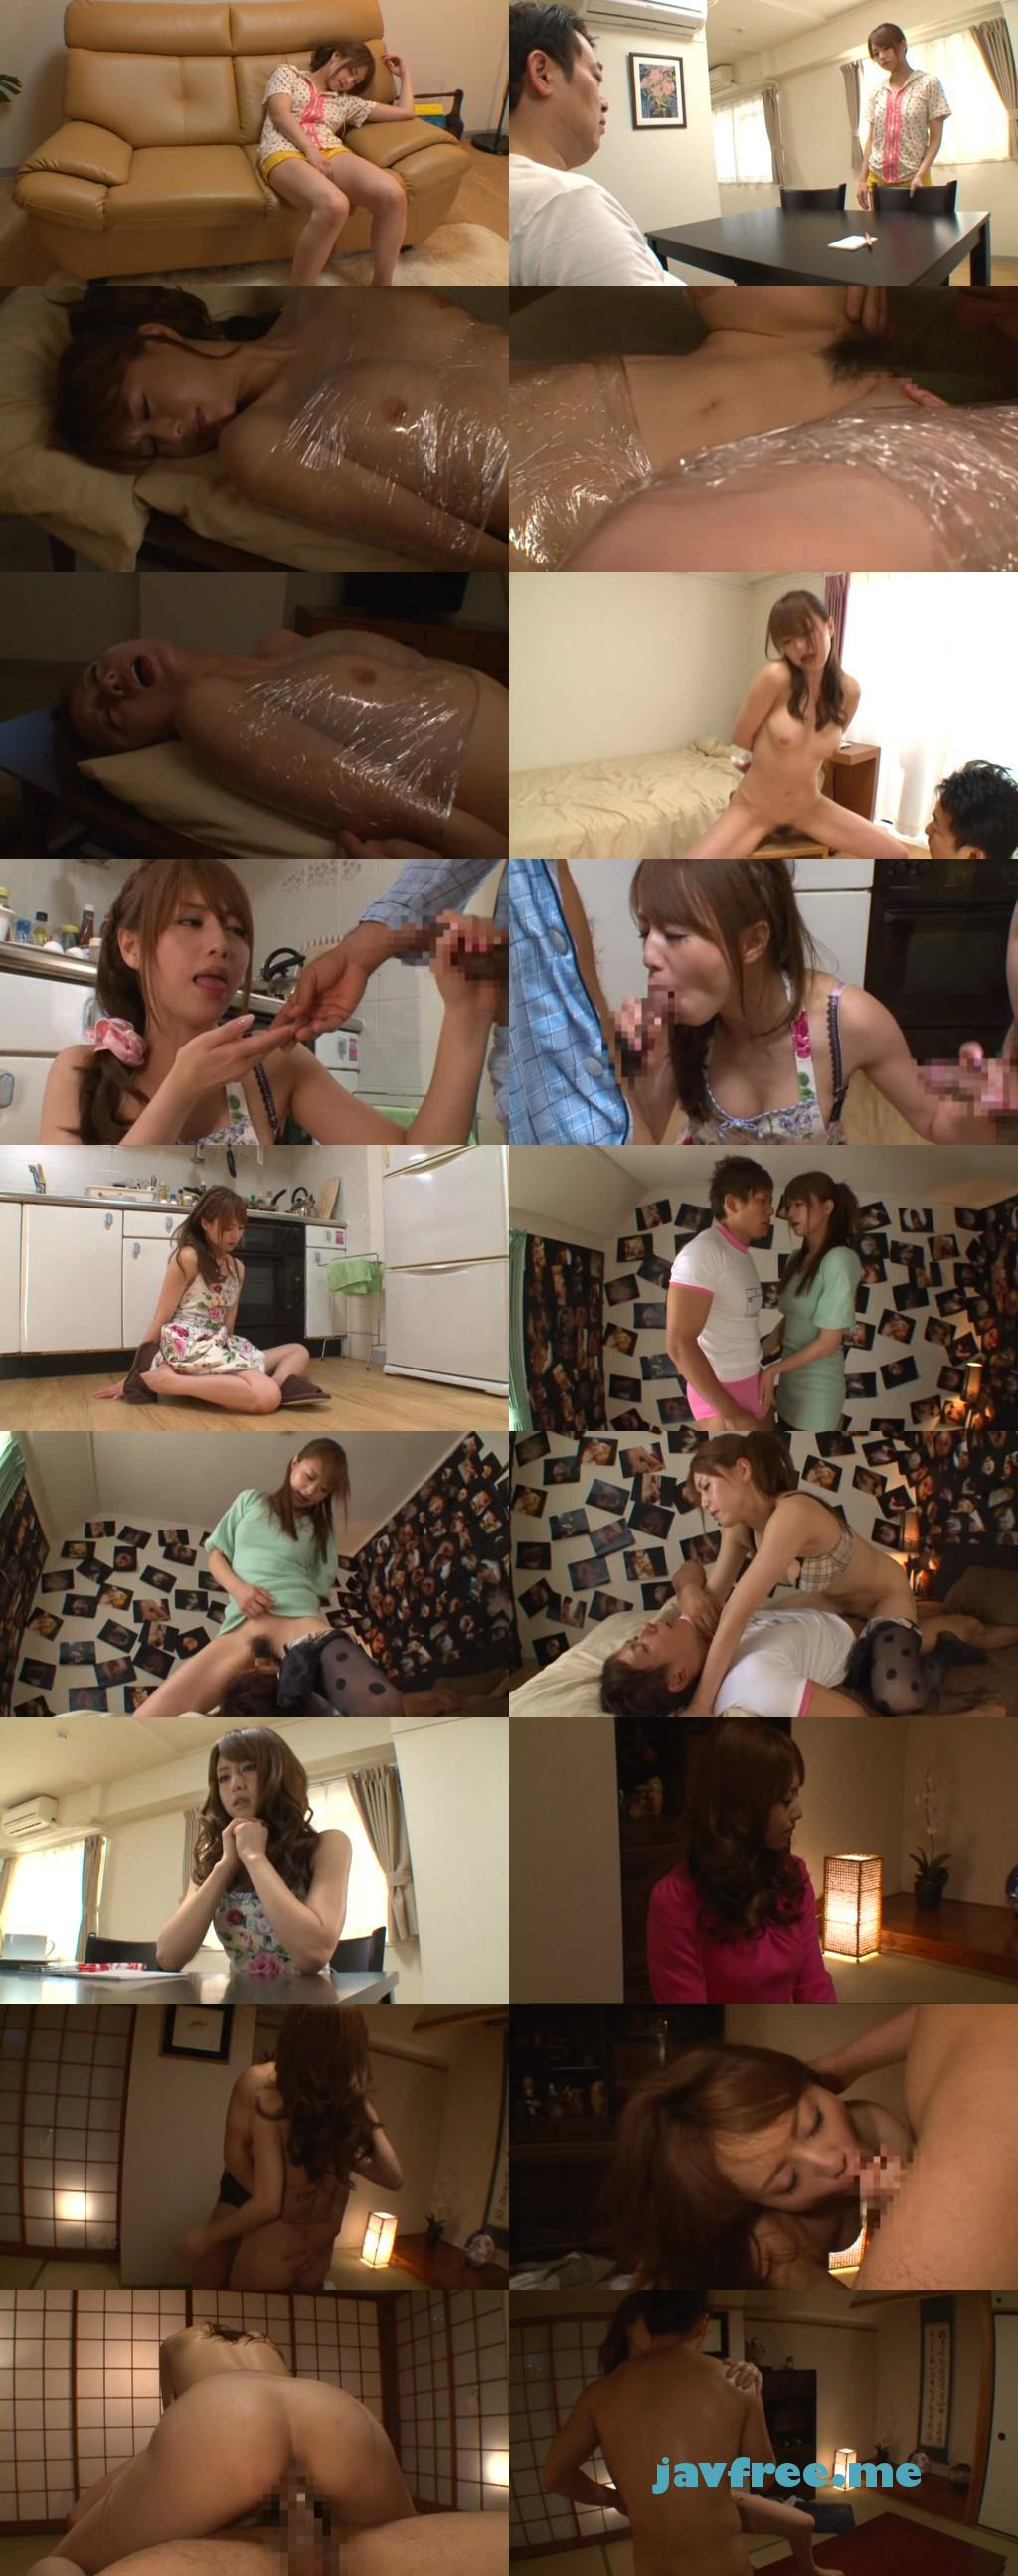 [DVD][MXGS-446] 犯され養女、明歩。 吉沢明歩 - image MXGS446 on https://javfree.me